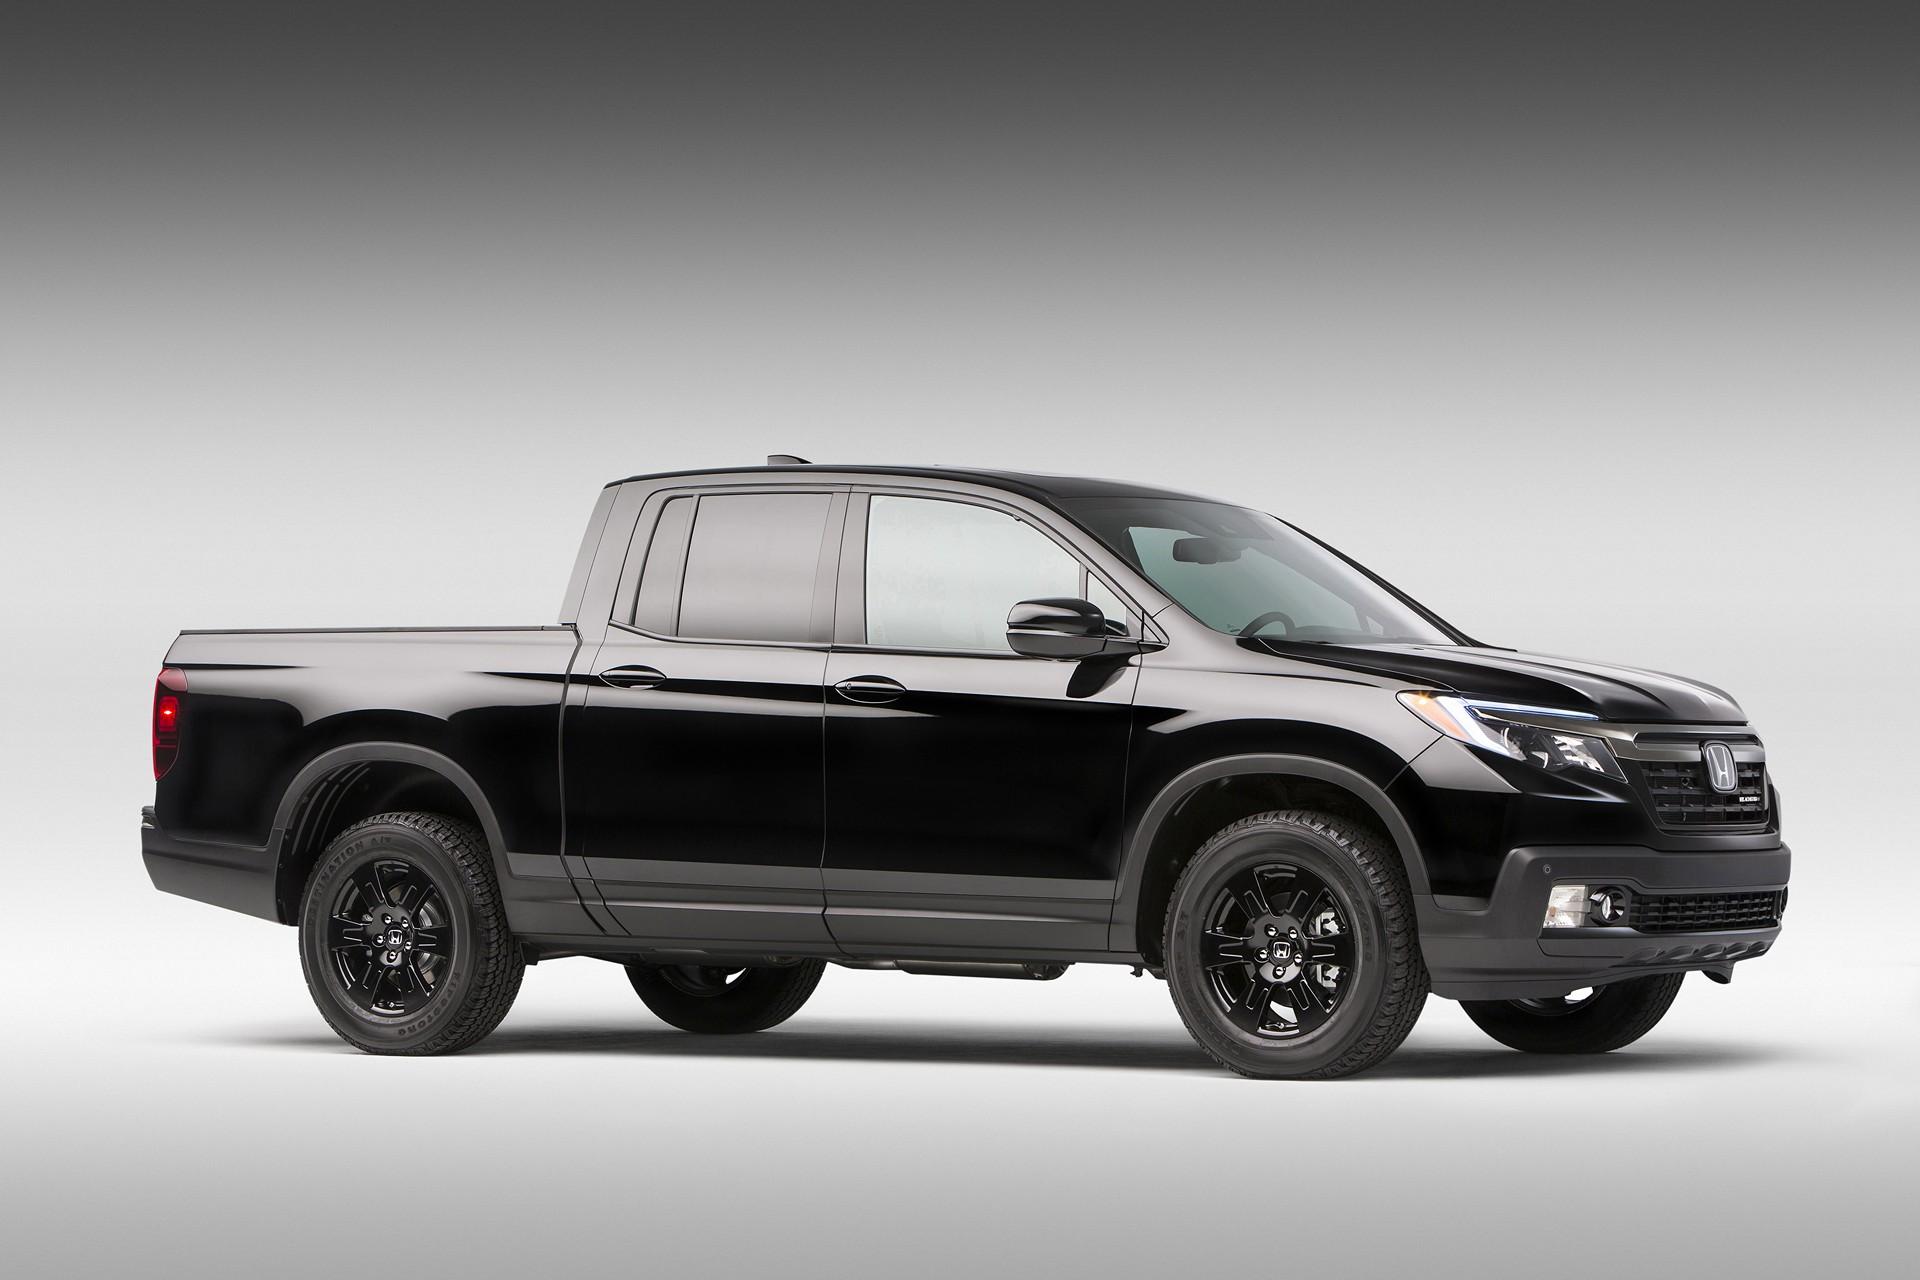 all new 2017 honda ridgeline pickup truck makes world debut at 2016 north american international. Black Bedroom Furniture Sets. Home Design Ideas